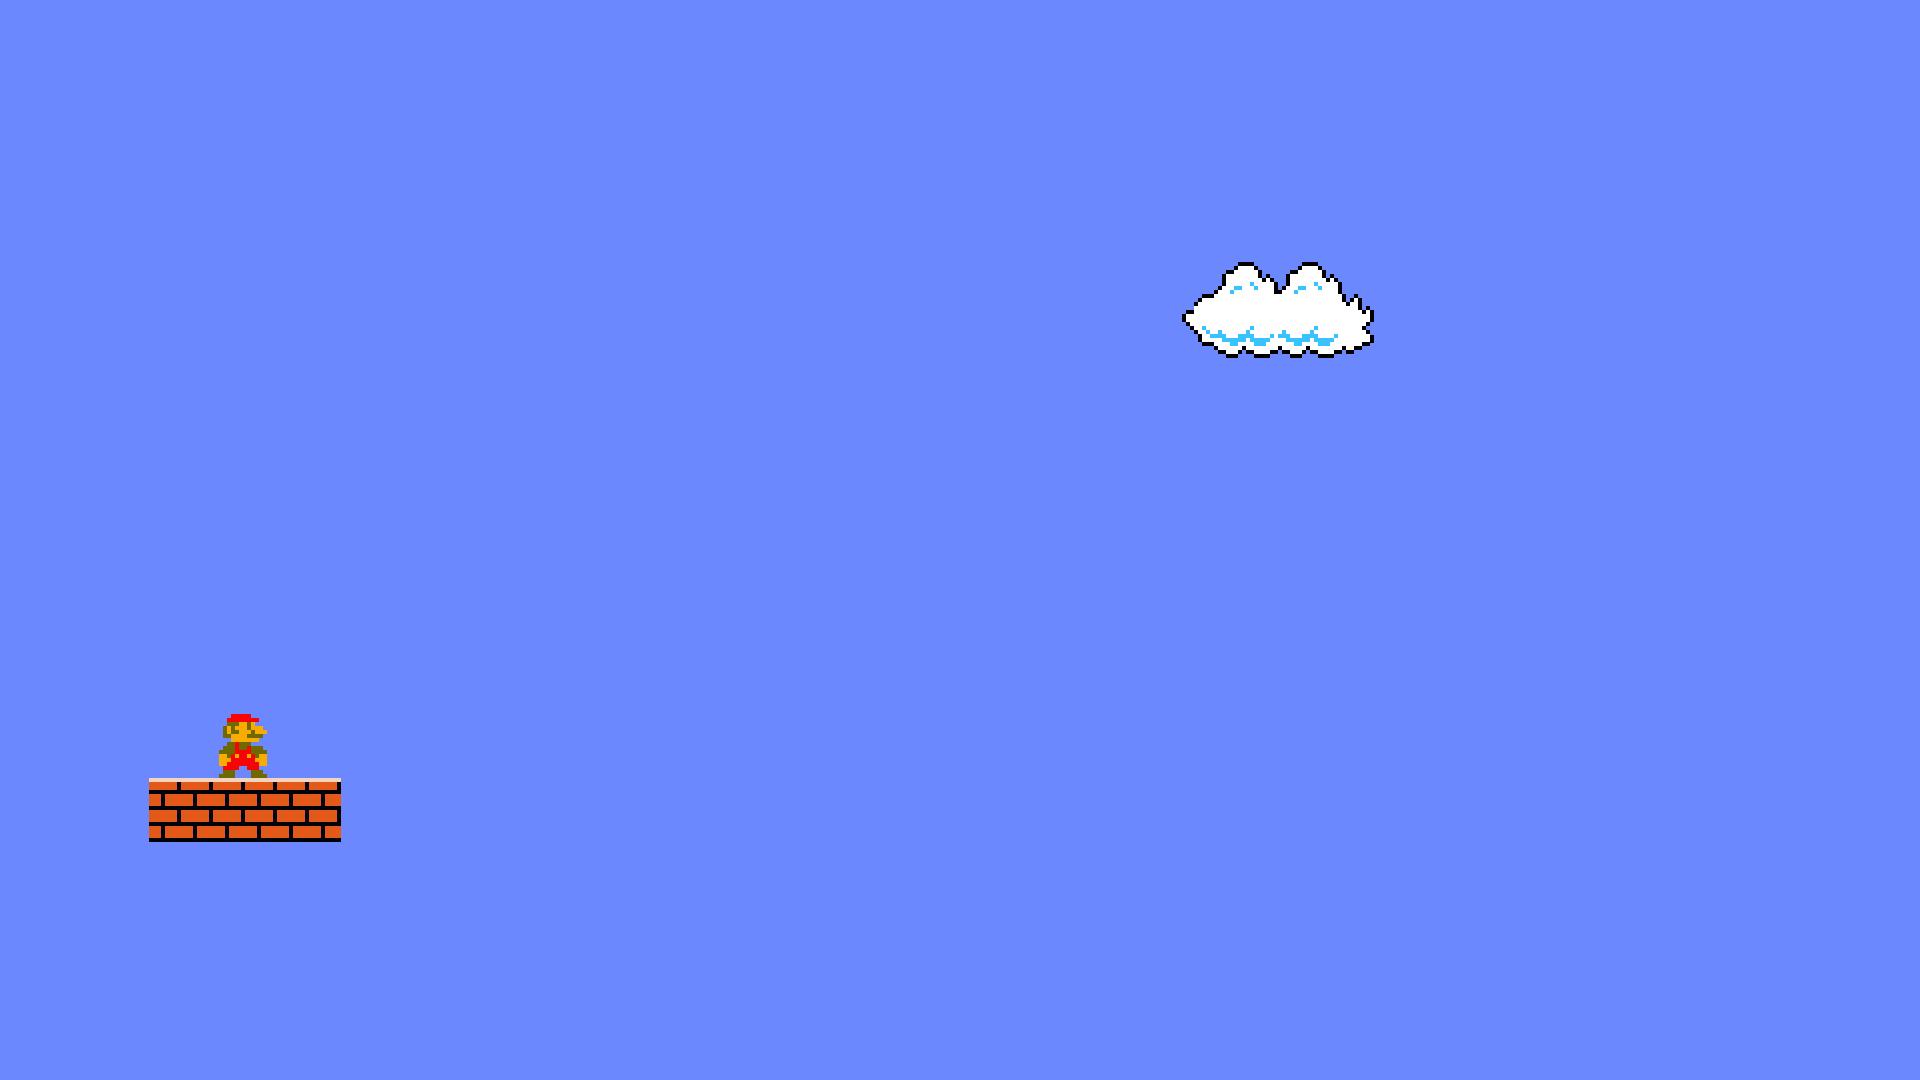 General 1920x1080 Mario Bros. Nintendo video games minimalism pixels pixel art digital art video game art Super Mario Bros.